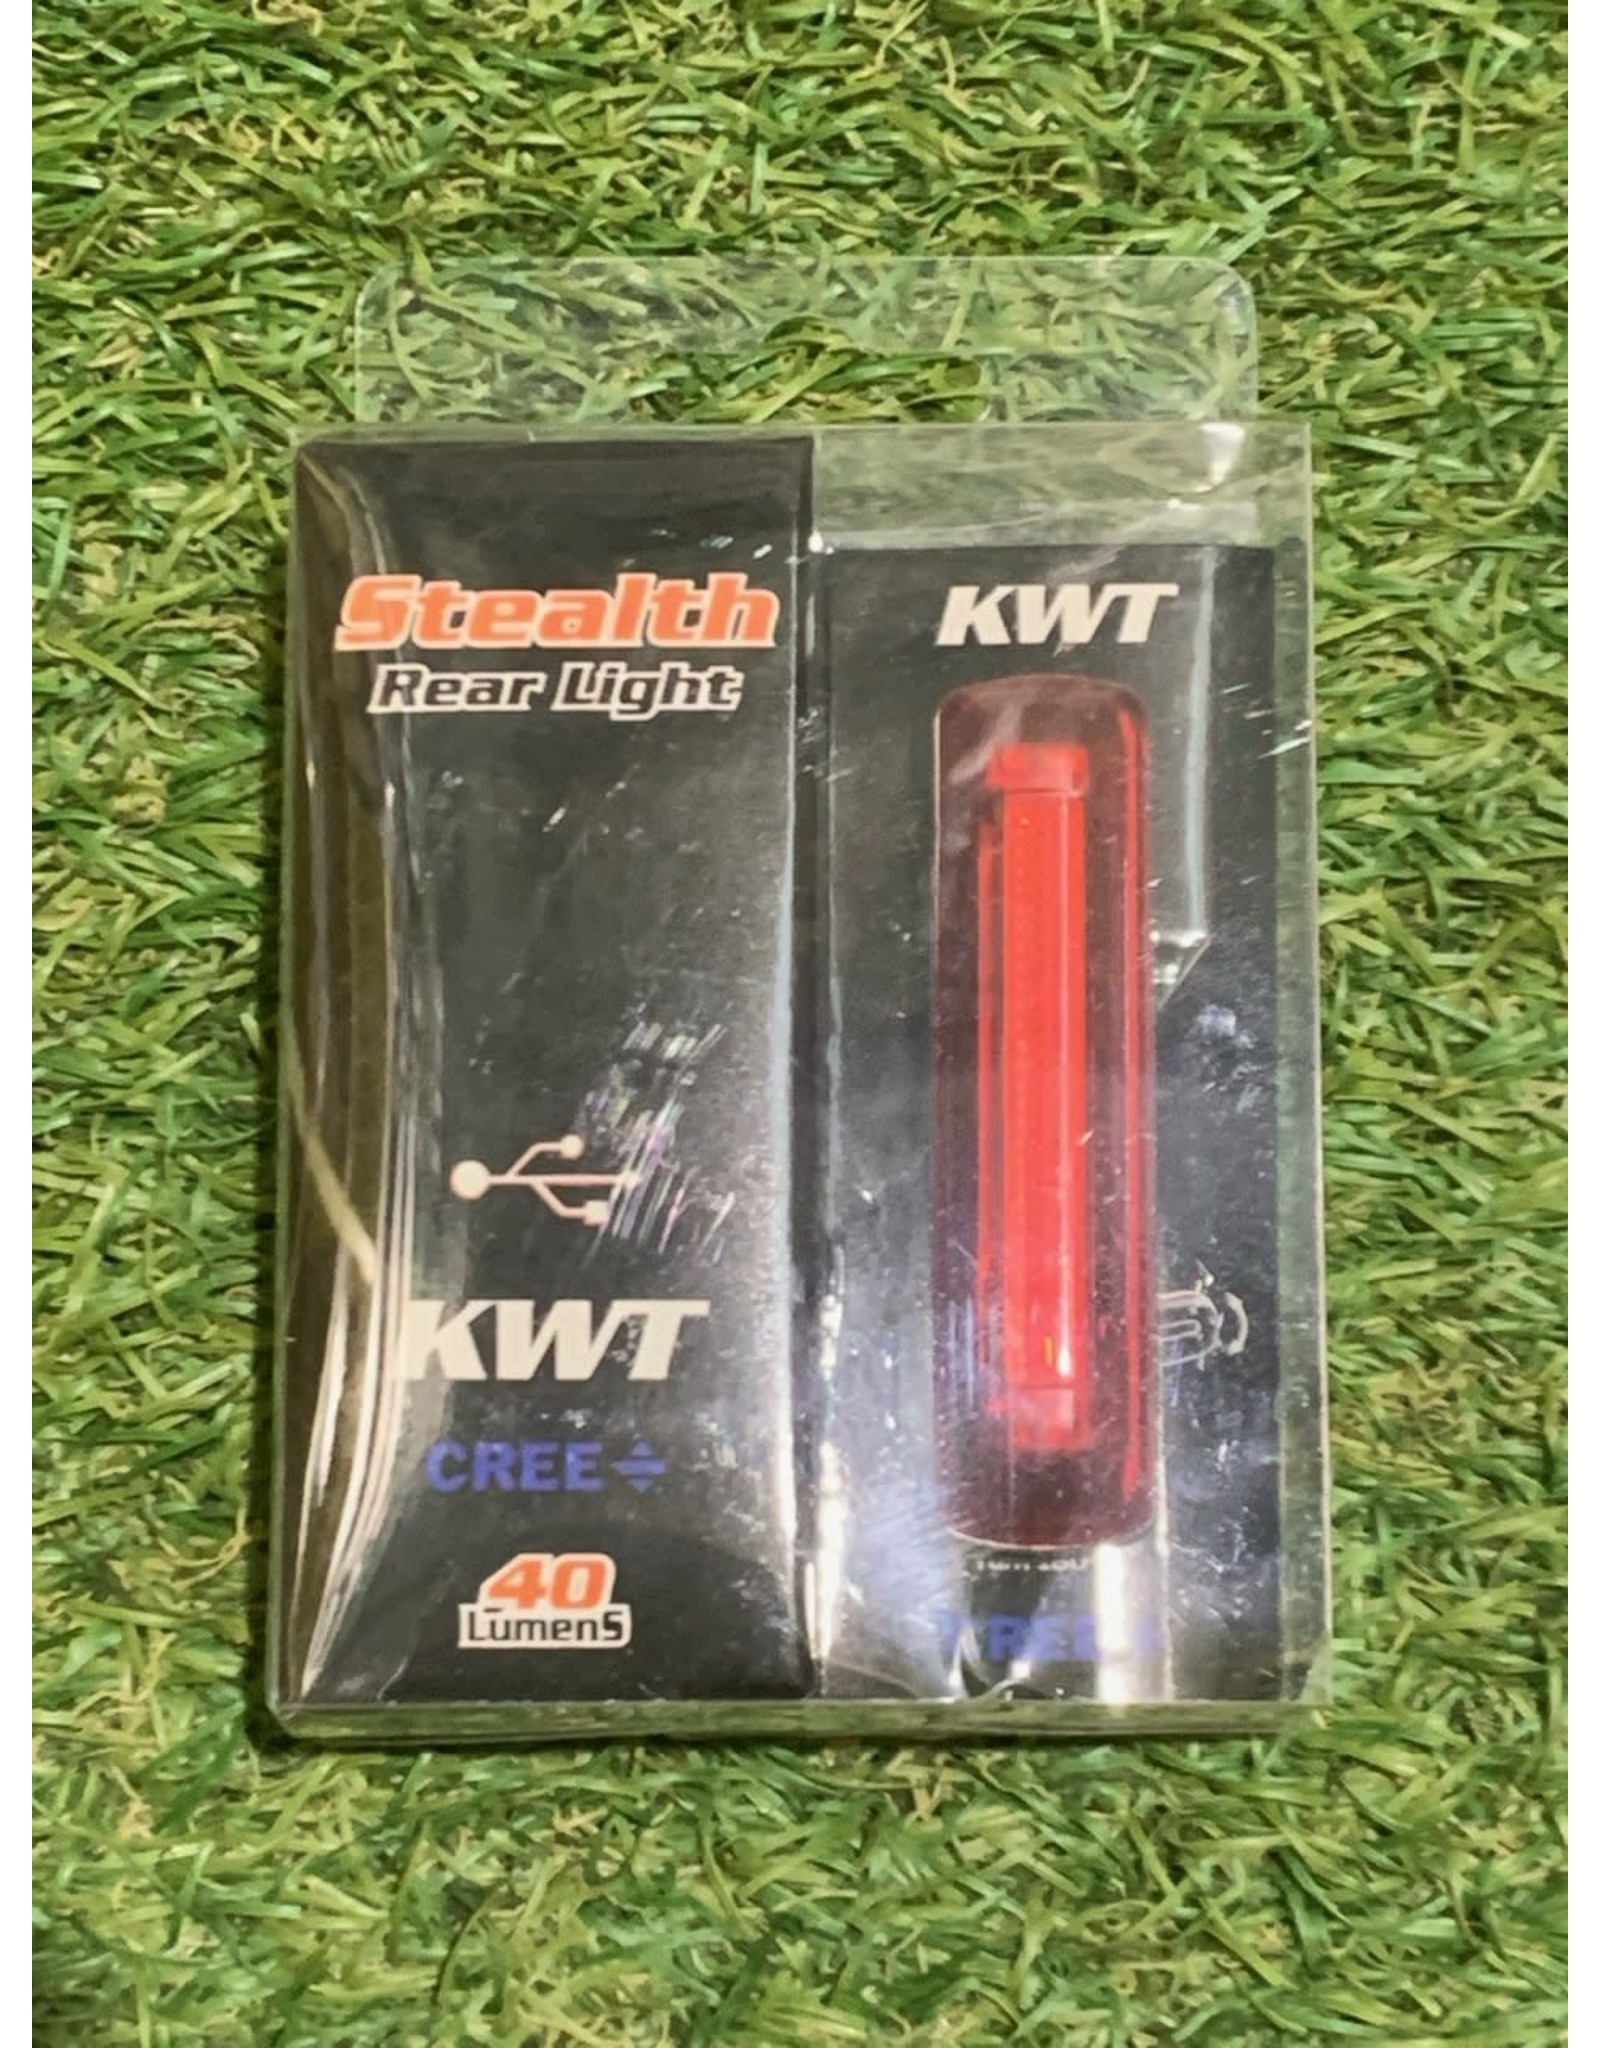 KWT STEALTH REAR LIGHT 40 LUMEN USB